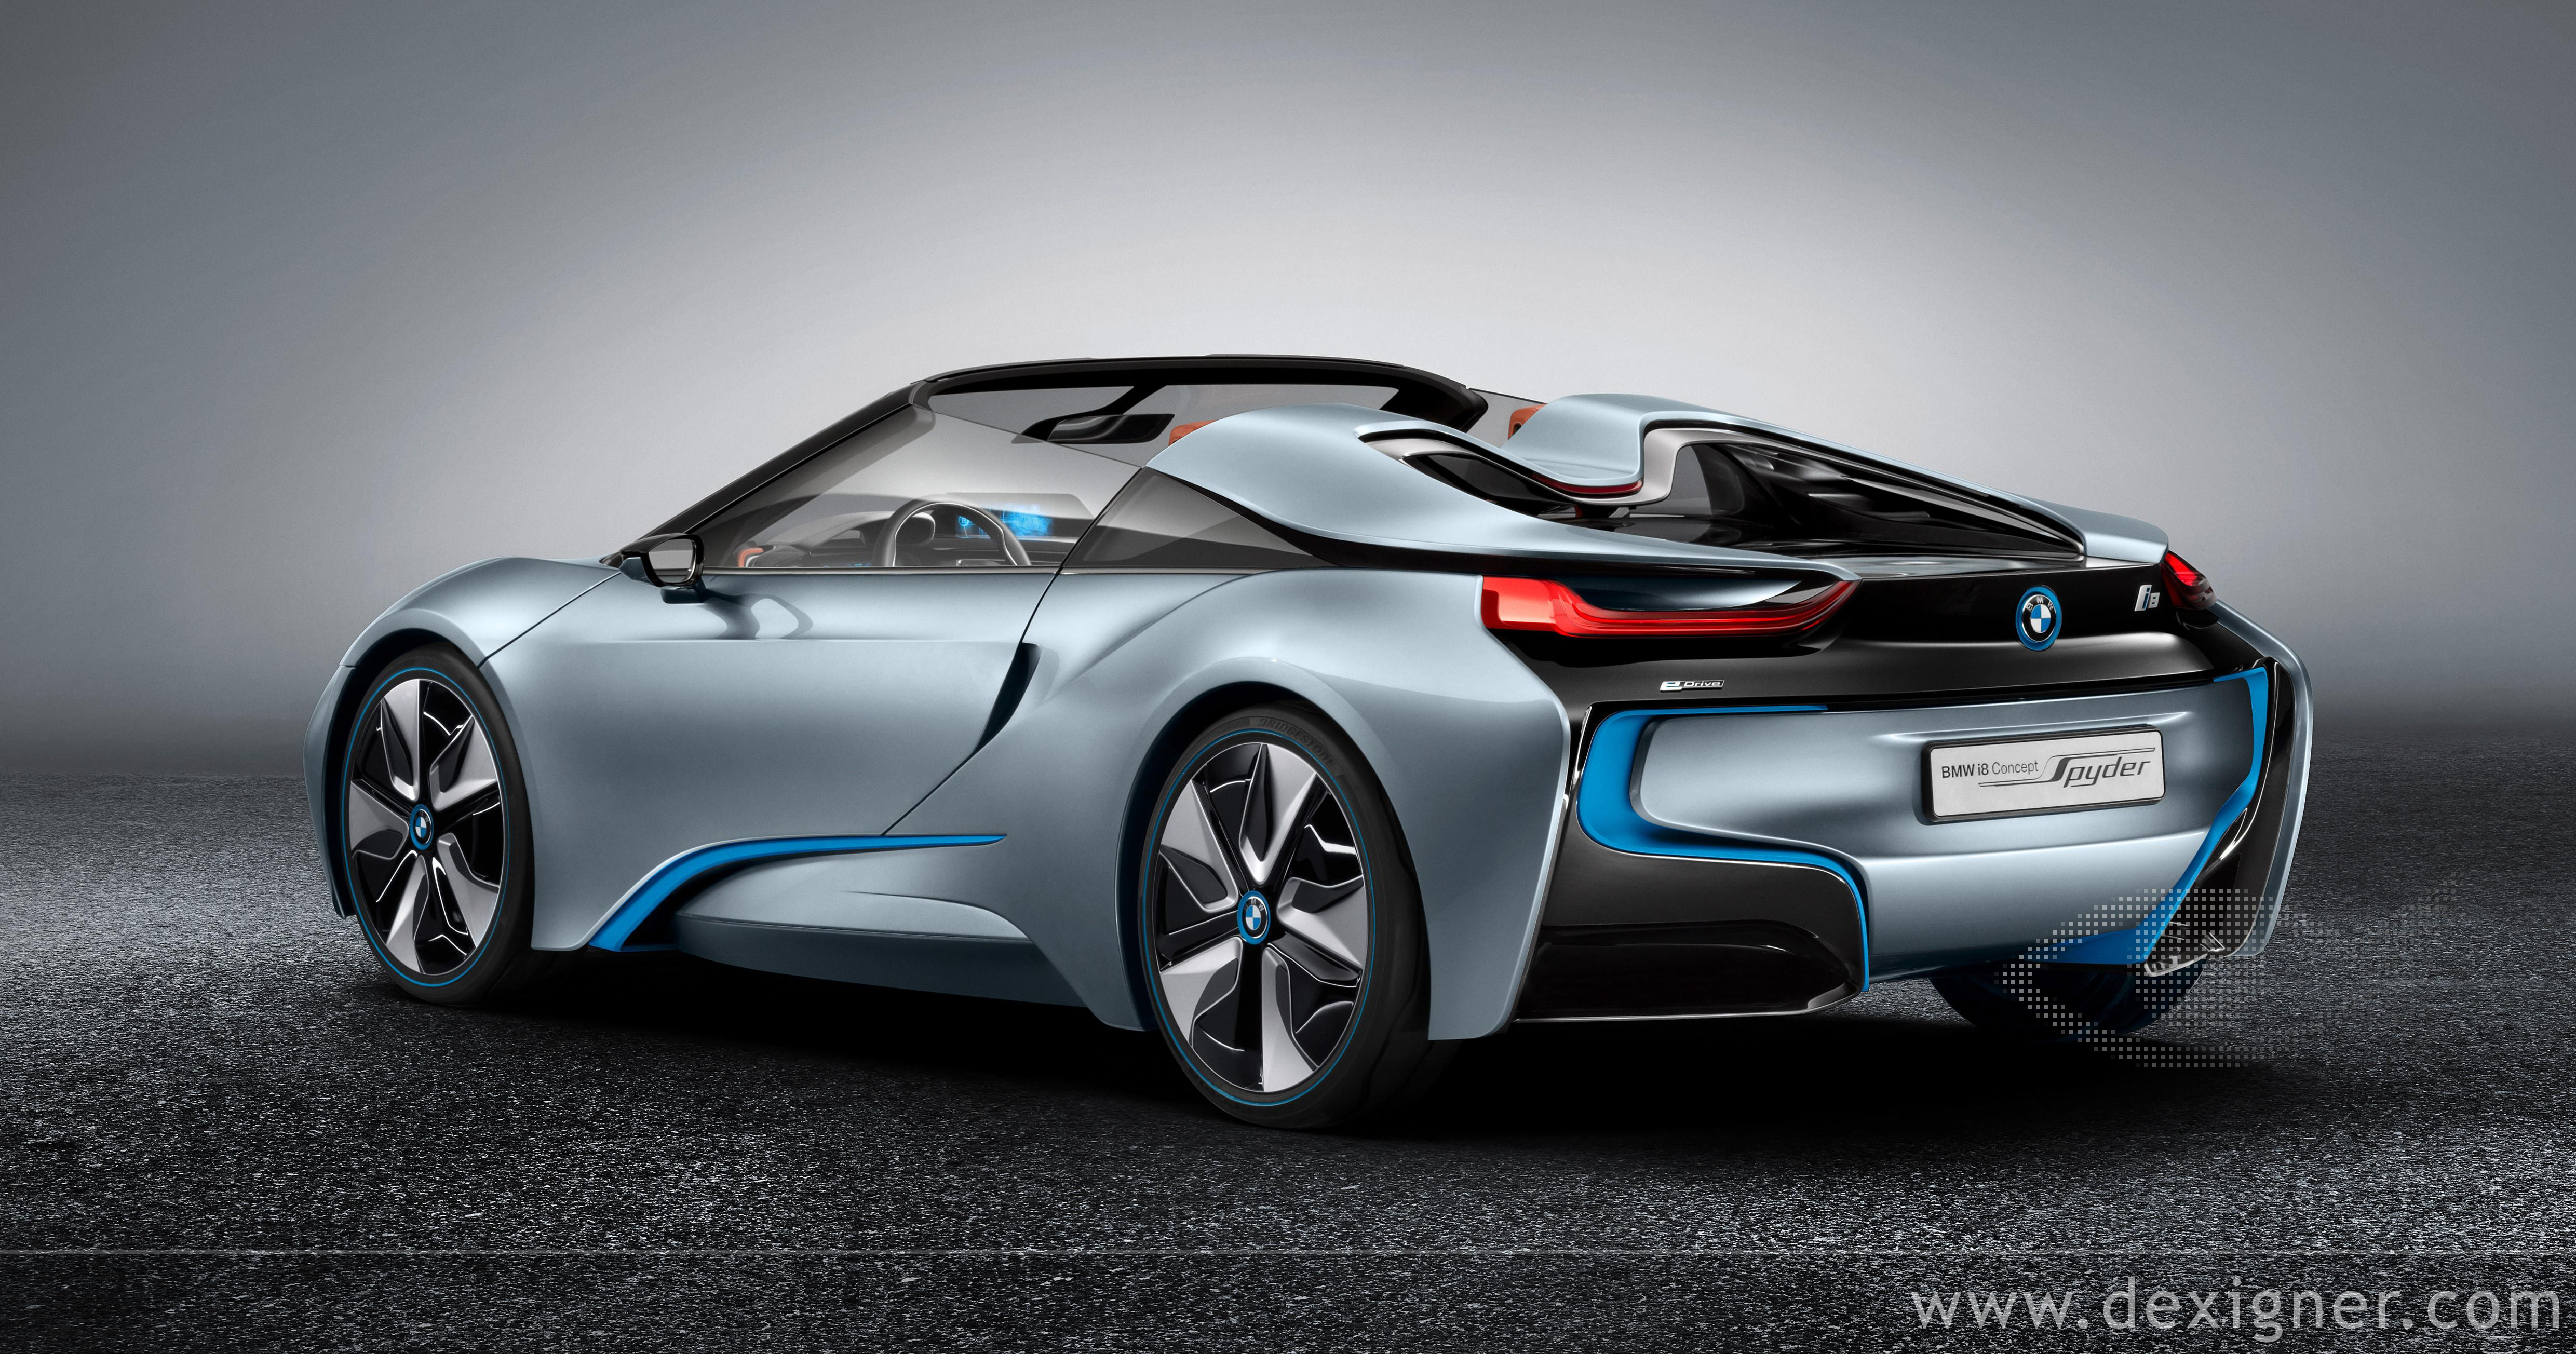 BMW_i8_Concept_Spyder_02.jpg (4961×2608)